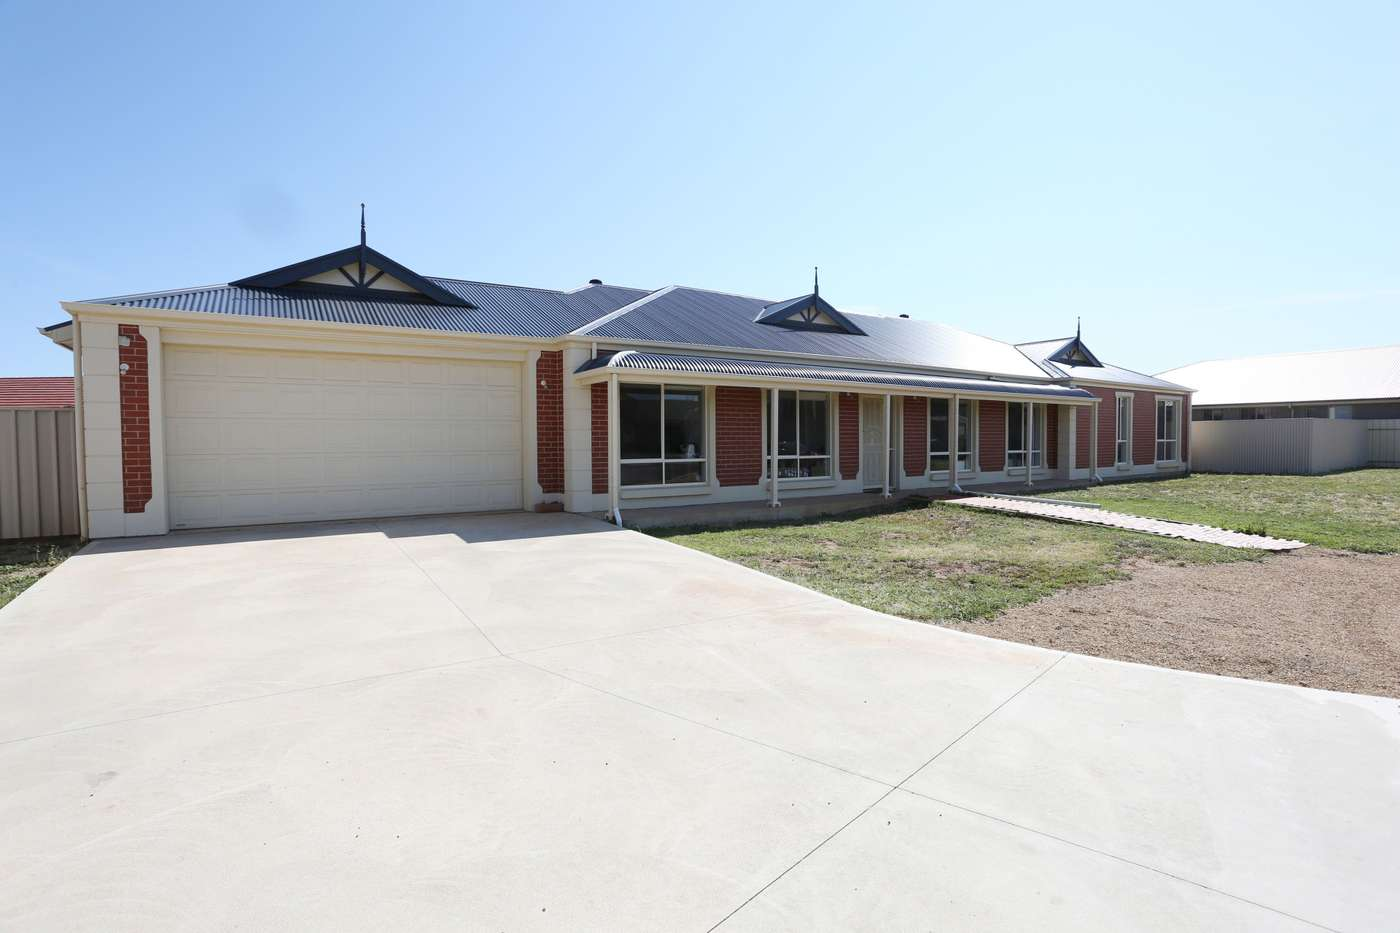 Main view of Homely house listing, 18 Honeysuckle Drive, Balaklava, SA 5461